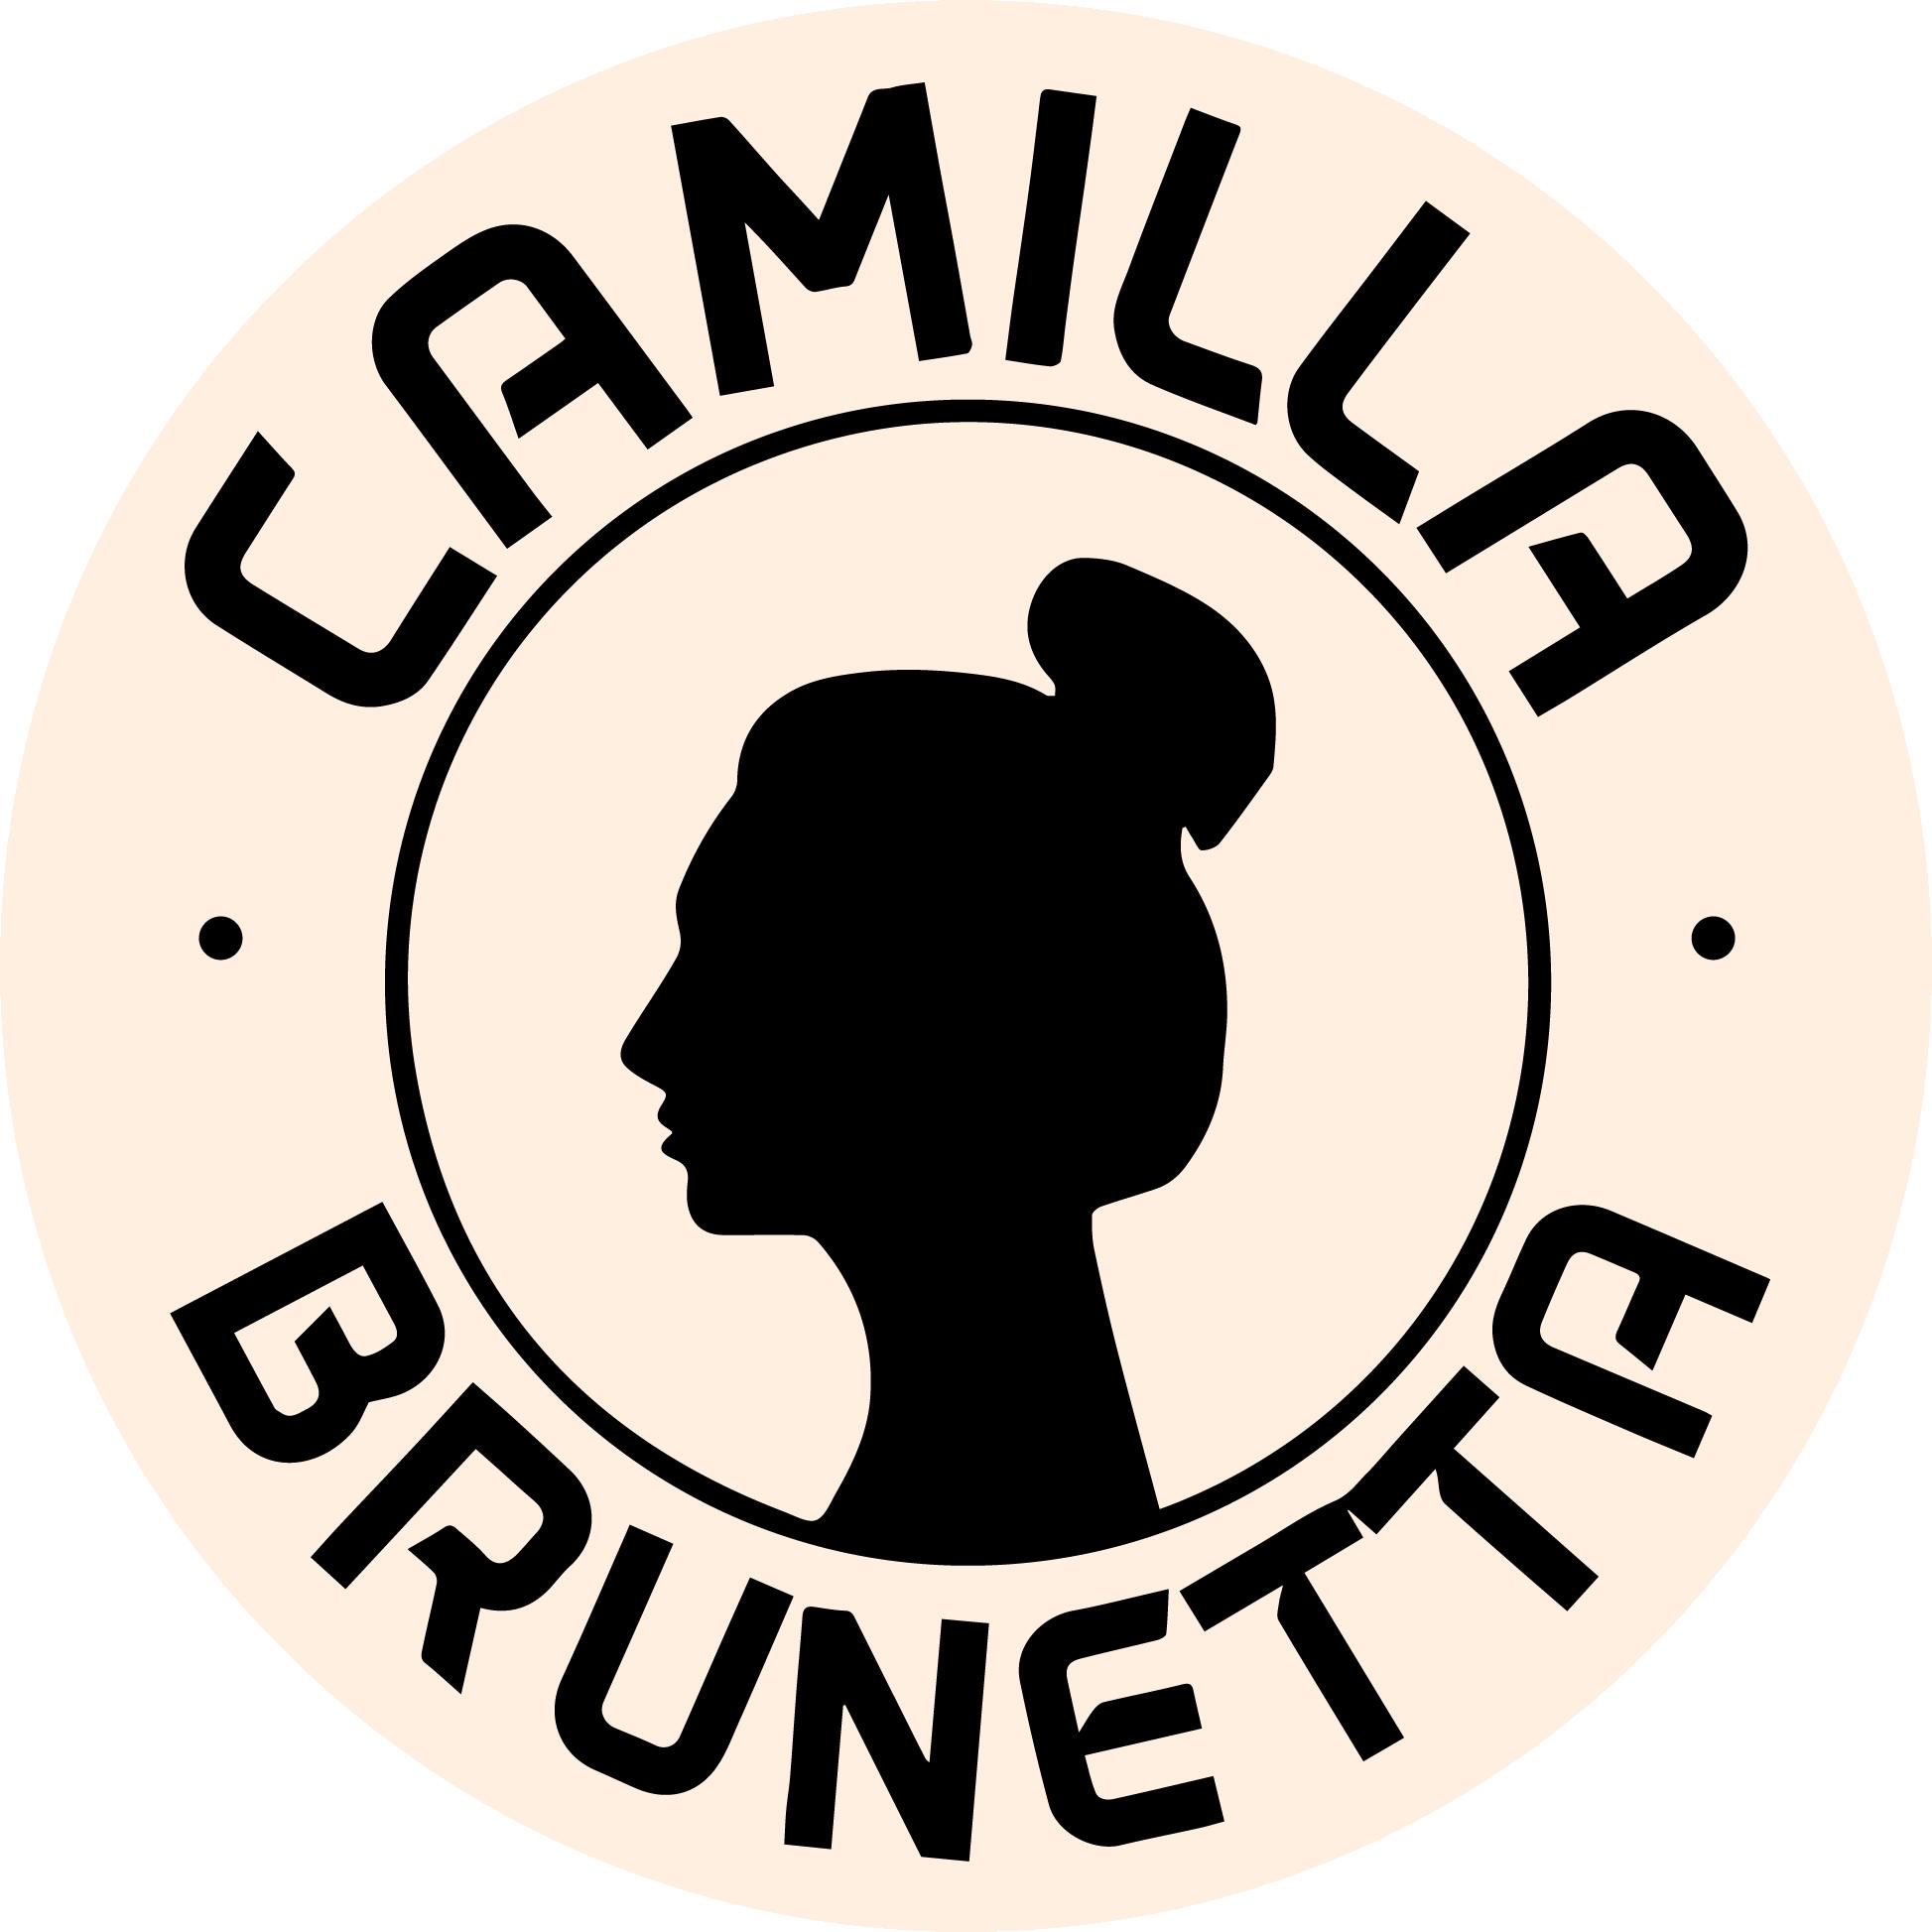 Camilla Brunetta